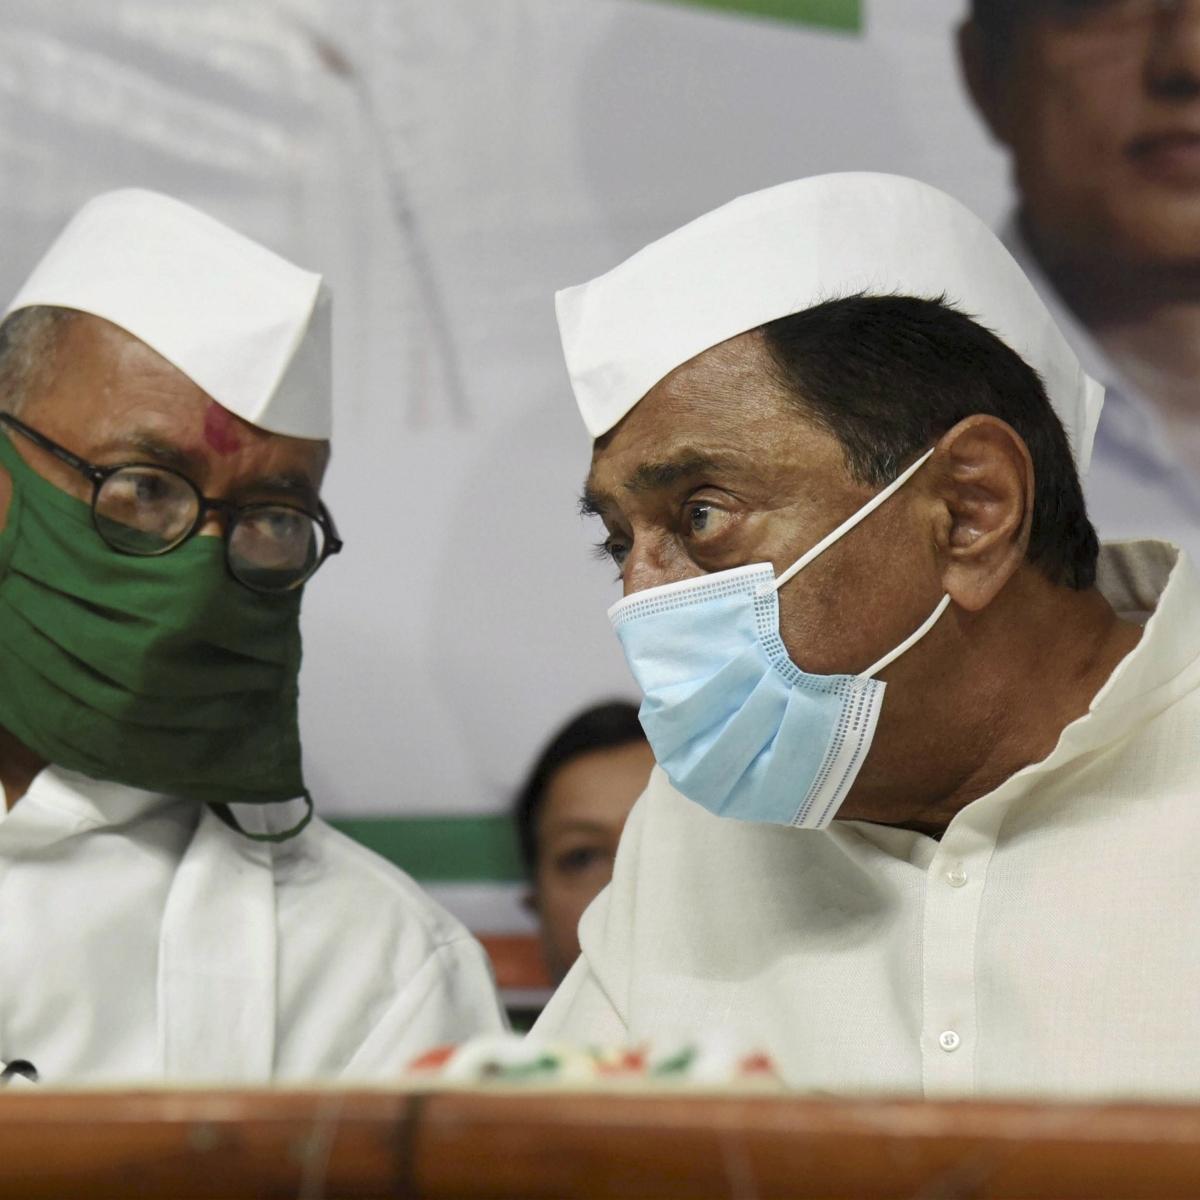 Madhya Pradesh Bypolls: Anger reigns against BJP faces, Congress running short of leaders